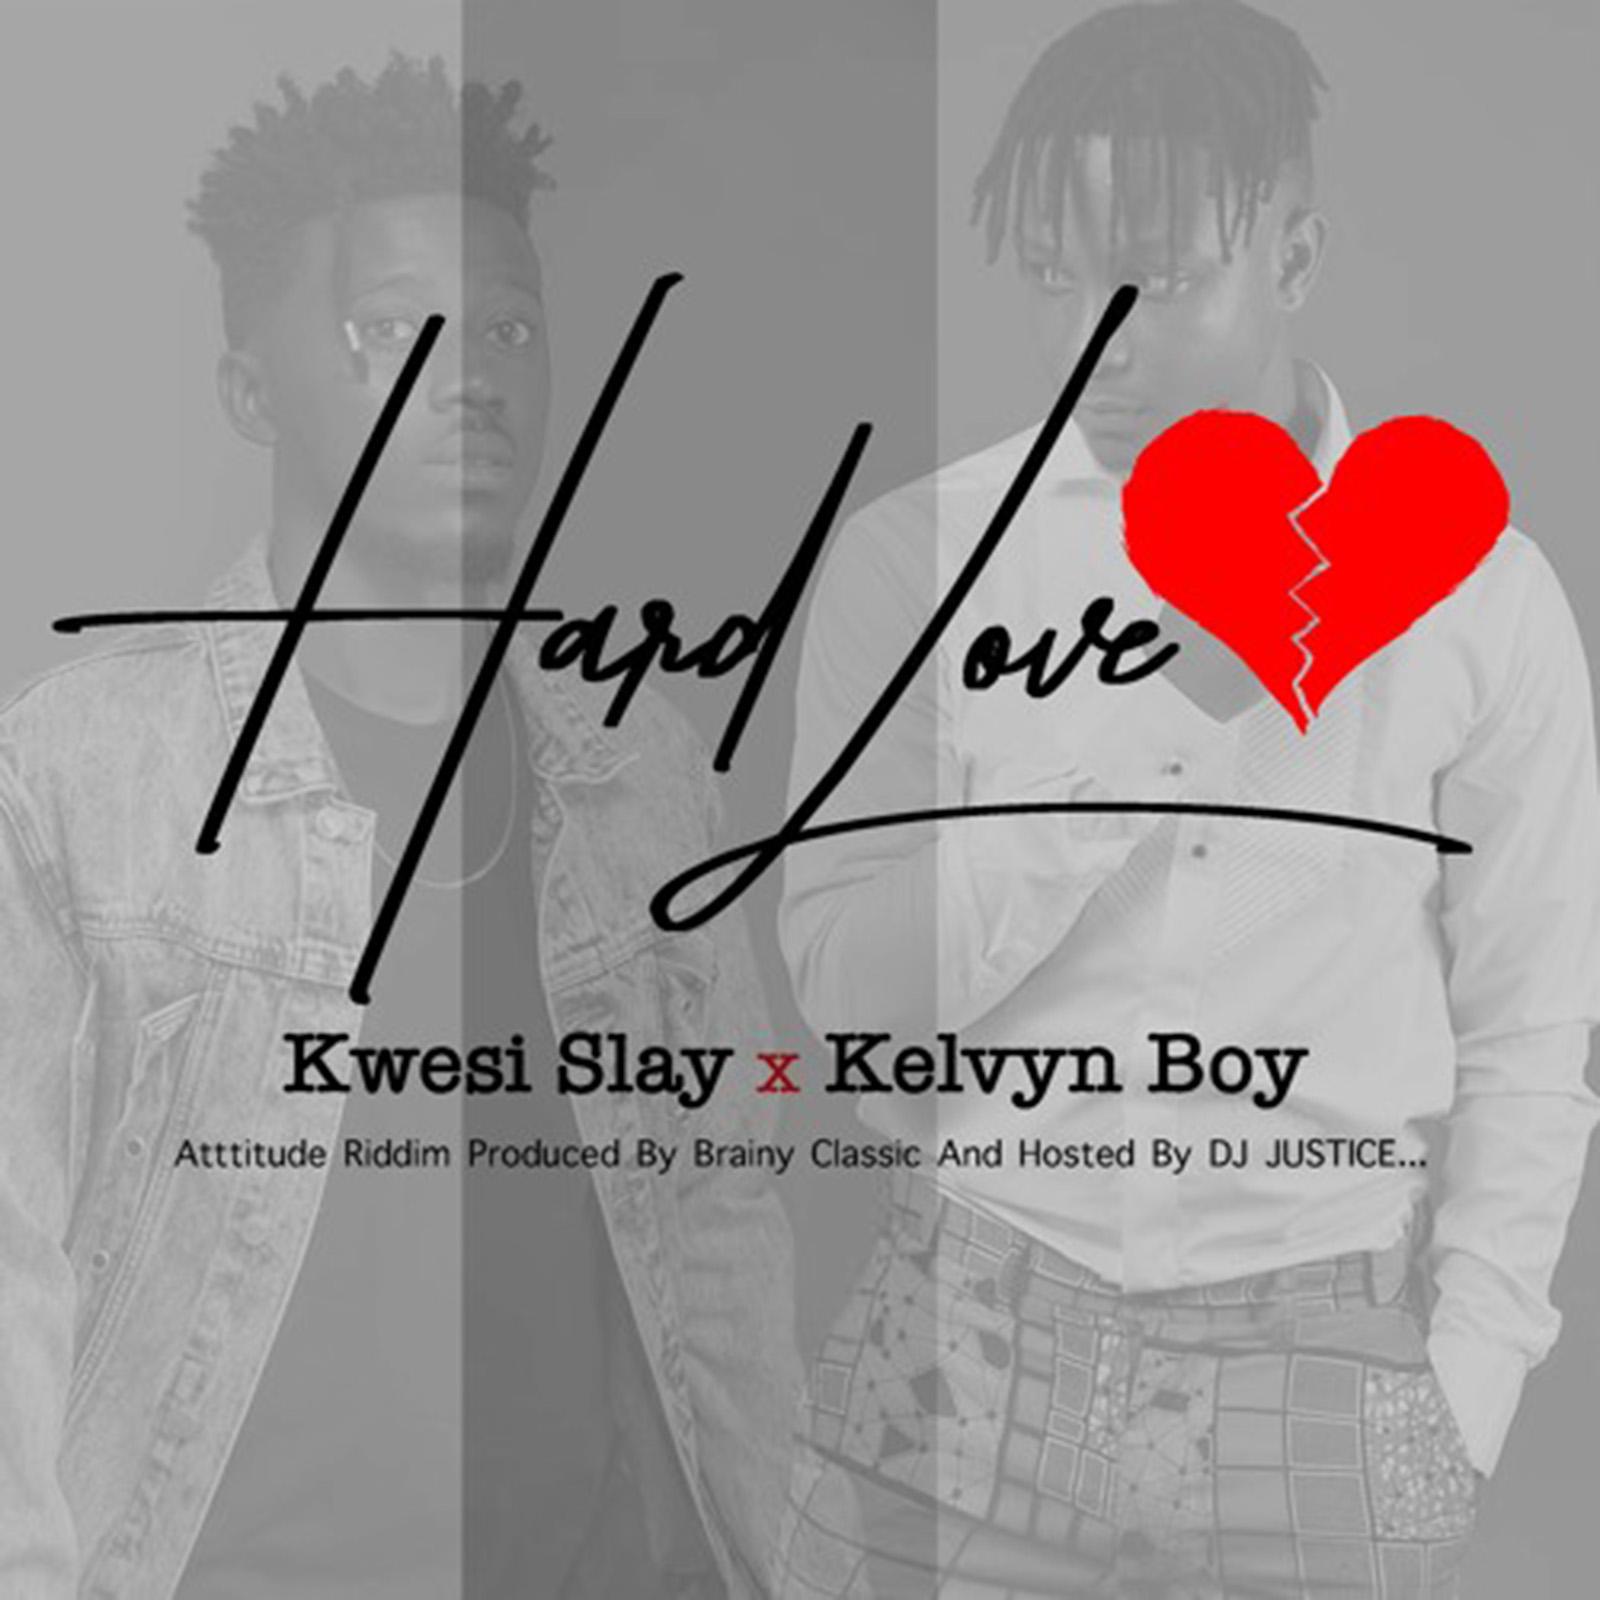 Hard Love by Kwesi Slay feat. Kelvyn Boy